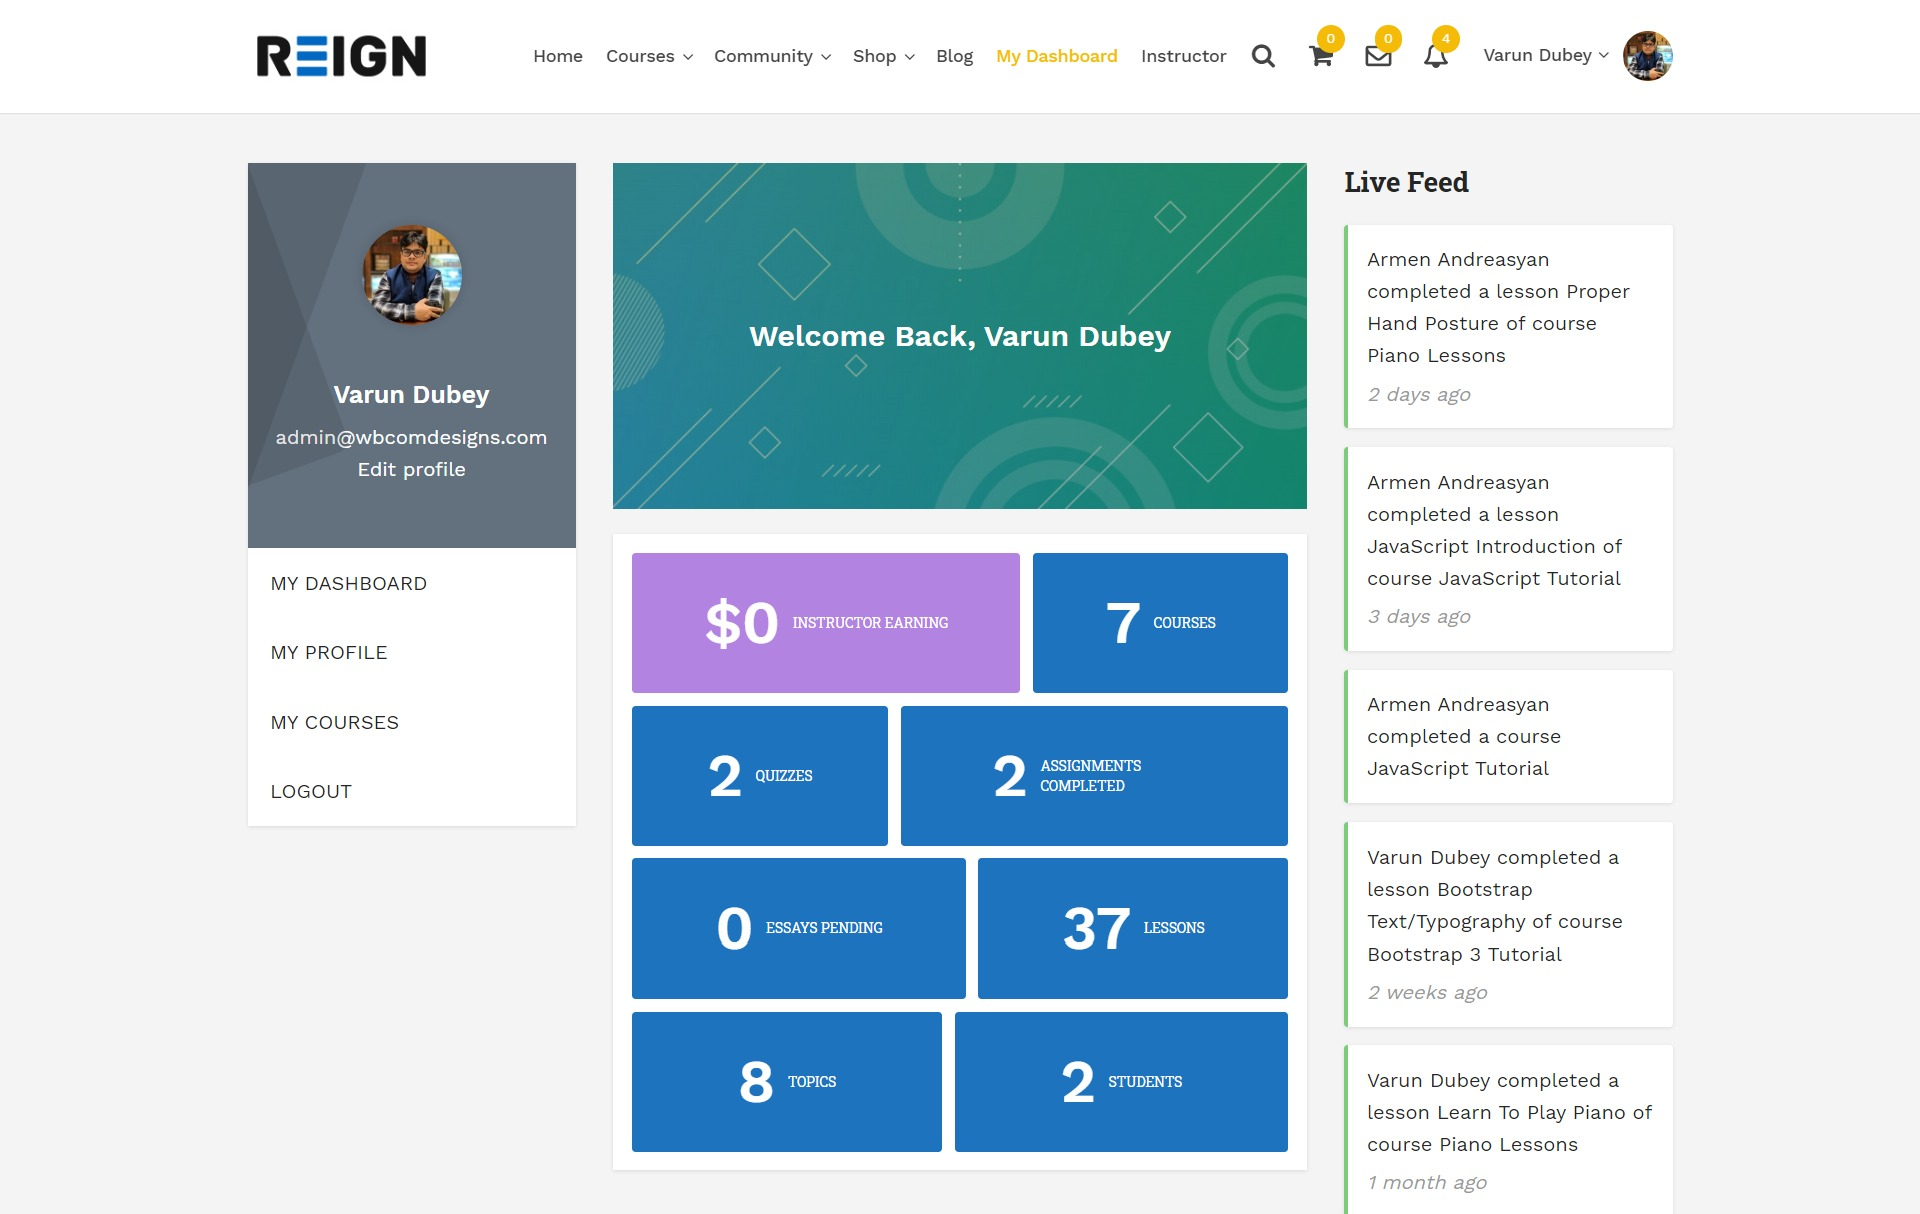 My Dashboard Widget Area - Wbcom Designs